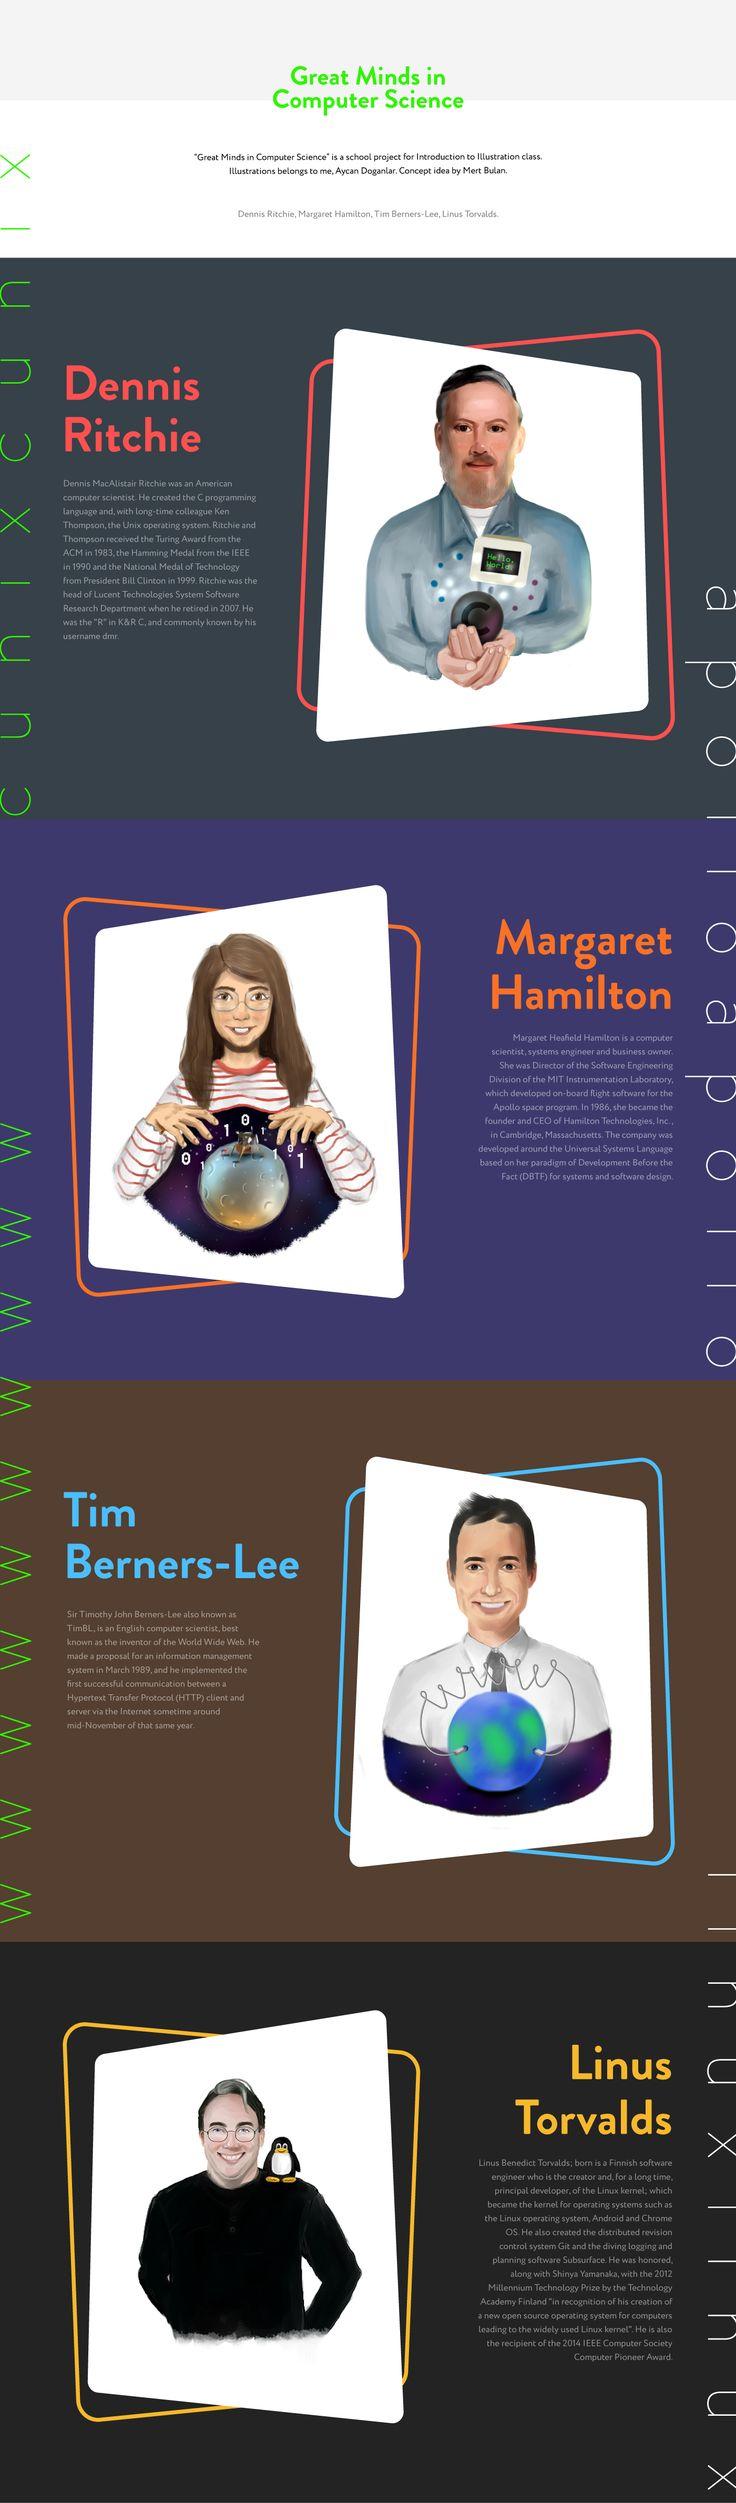 Dennis Ritchie, Margaret Hamilton, Tim Berners-Lee, Linus Torvalds